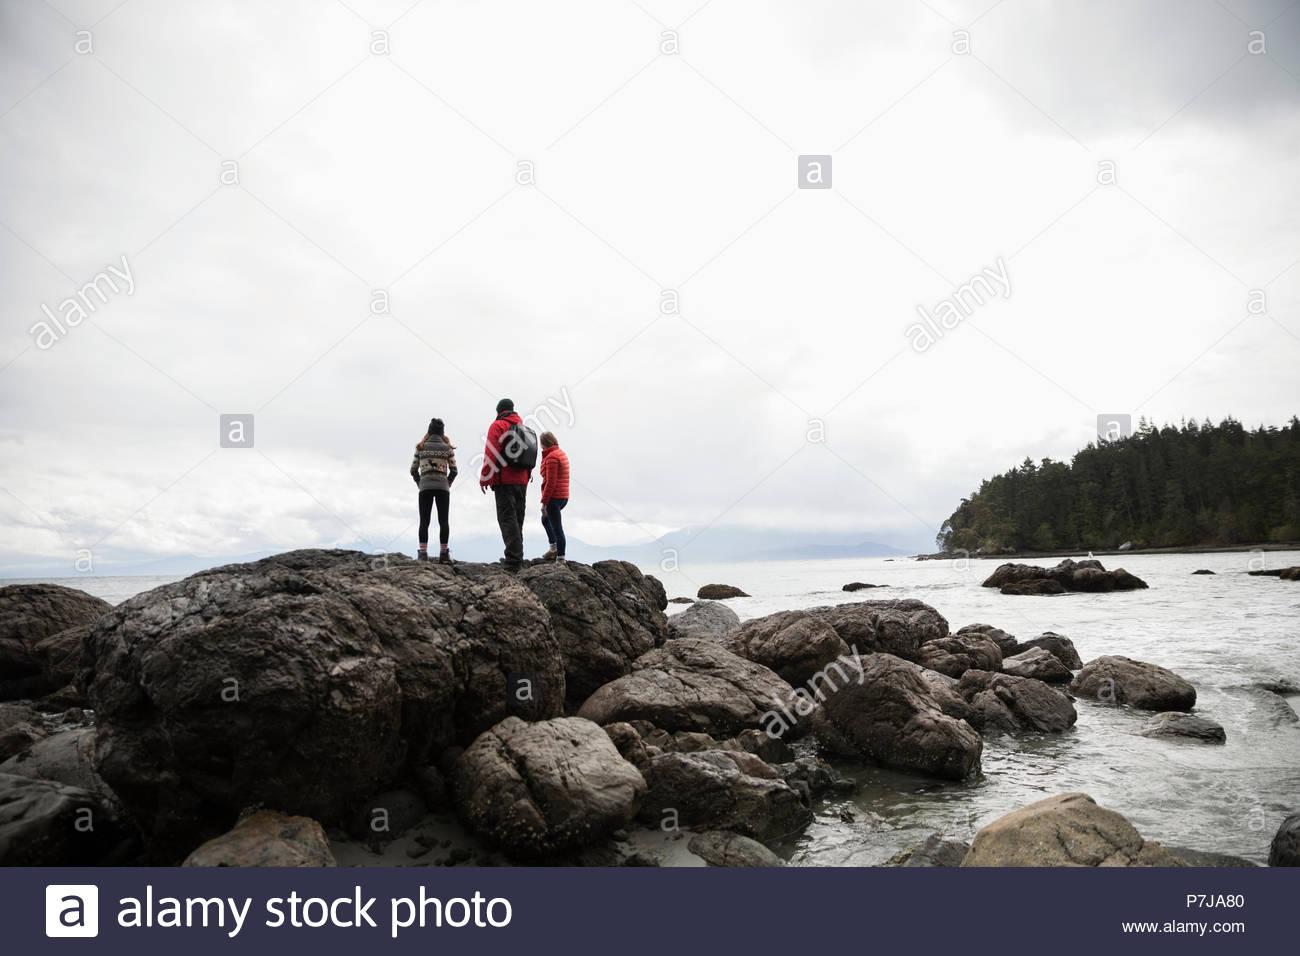 Familie auf Felsen genießen Robuste ocean view Stockbild